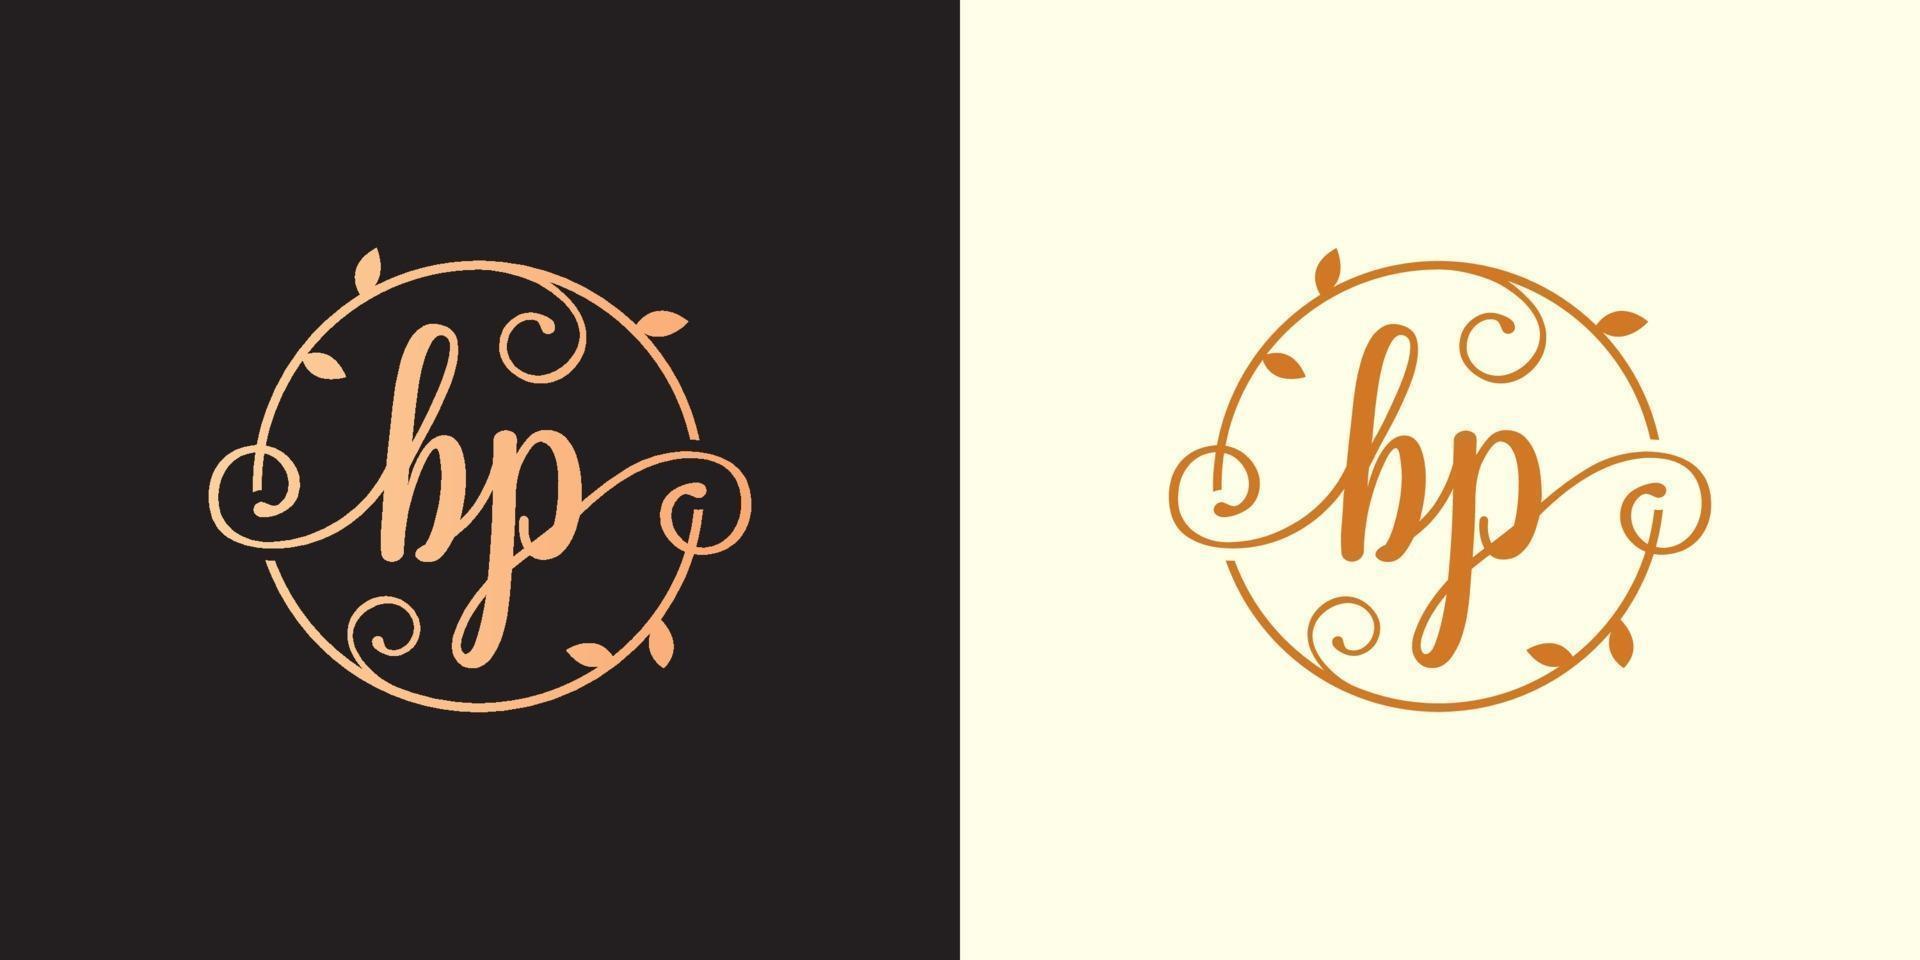 Decorative, luxury Letter BP initial, Classy Monogram logo inside a circular stalk, stem, nest, root with leaves elements. Letter BP flower bouquet wedding logo vector